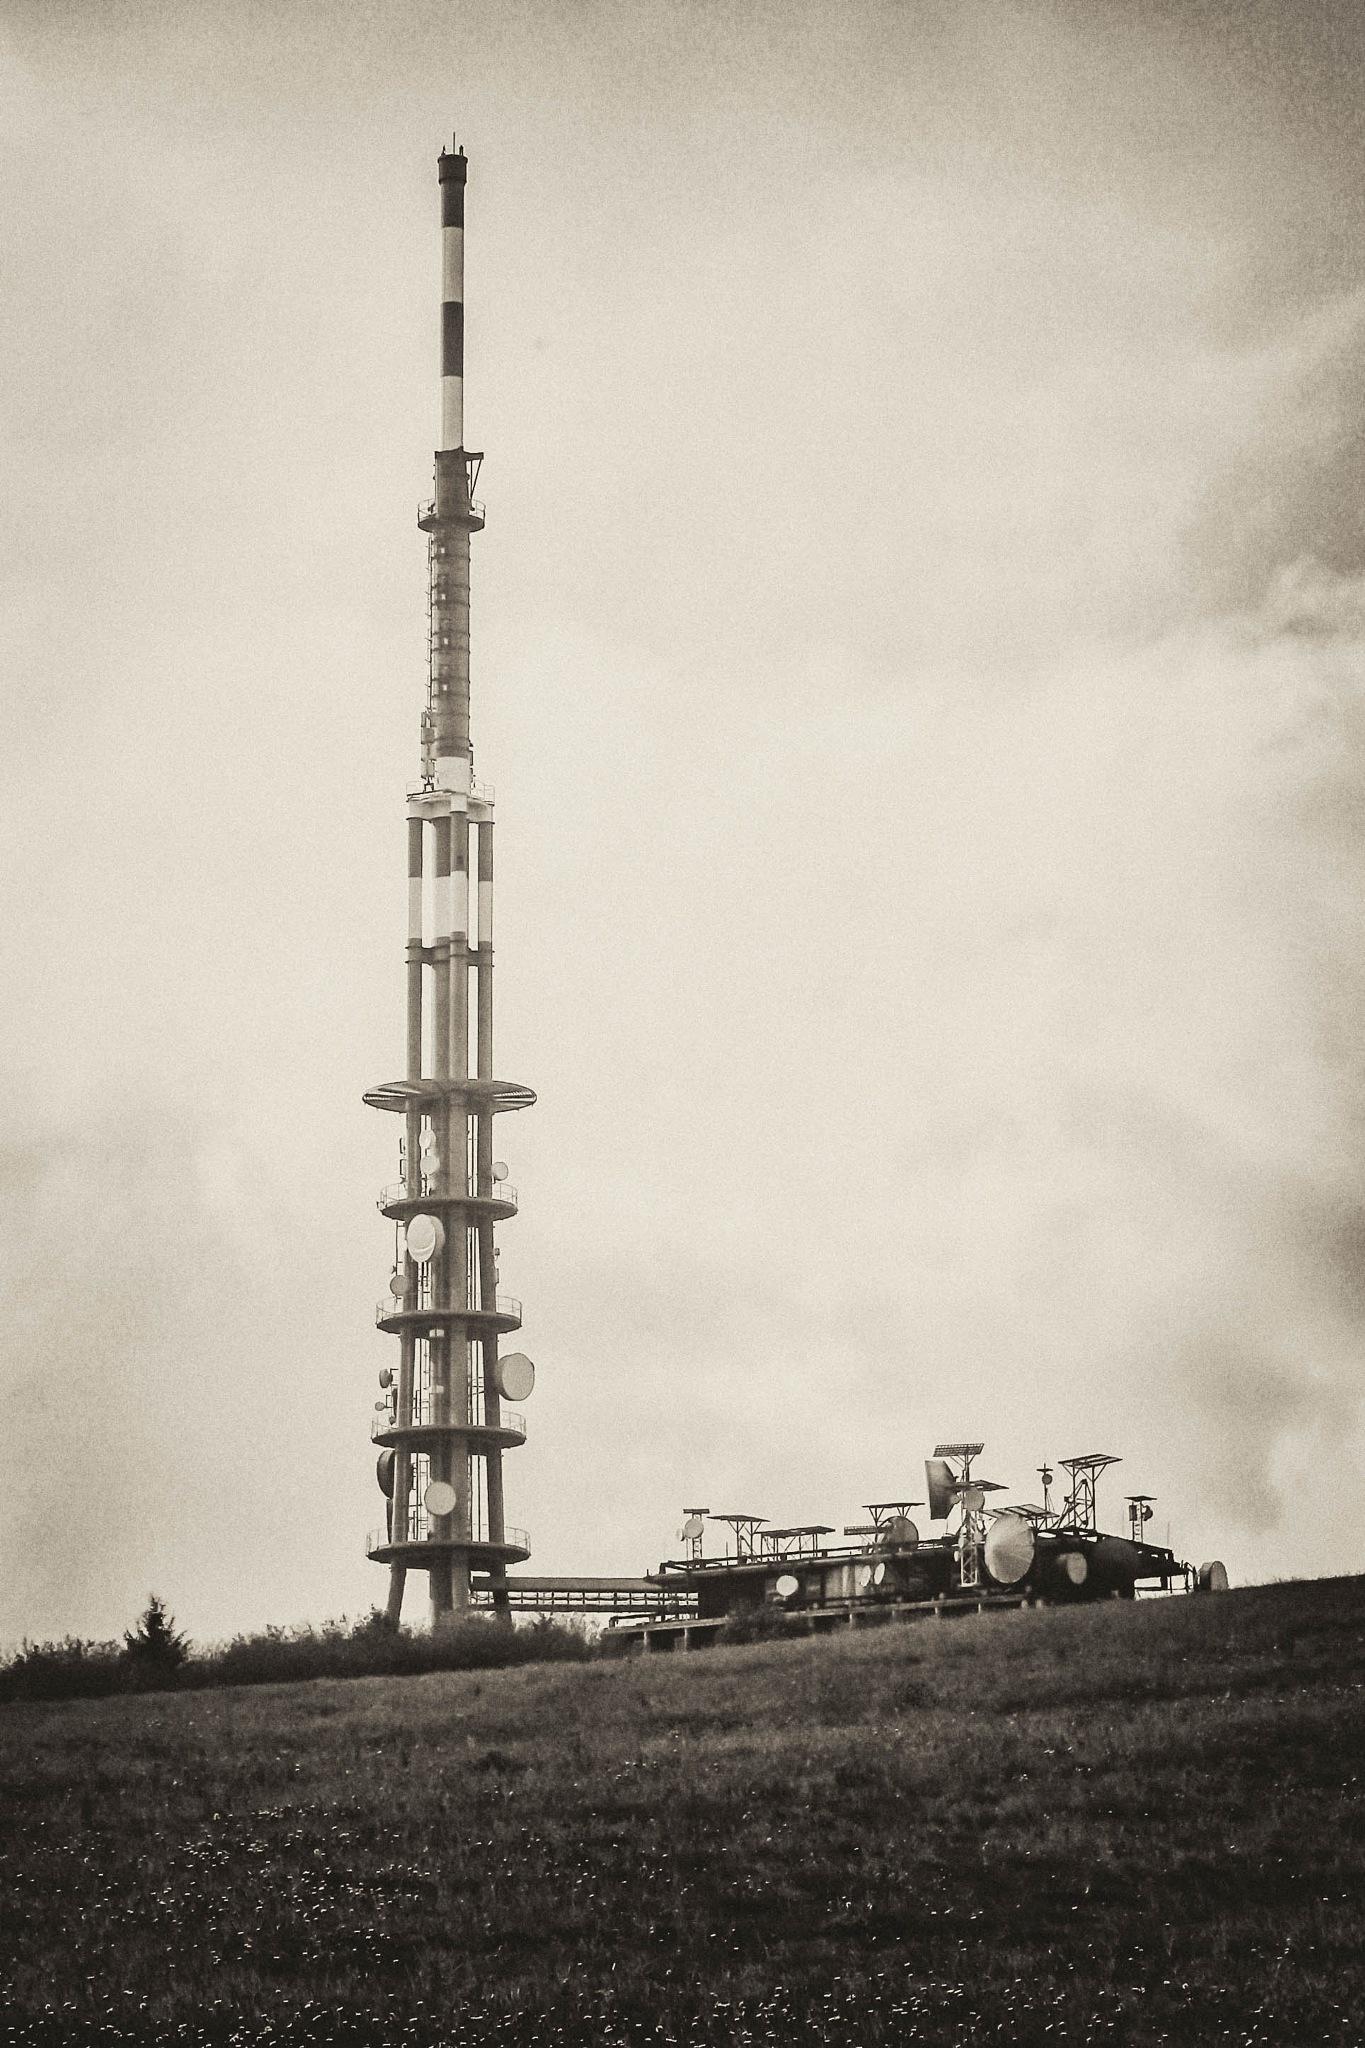 Javorina transmitter by Pavol Vesely